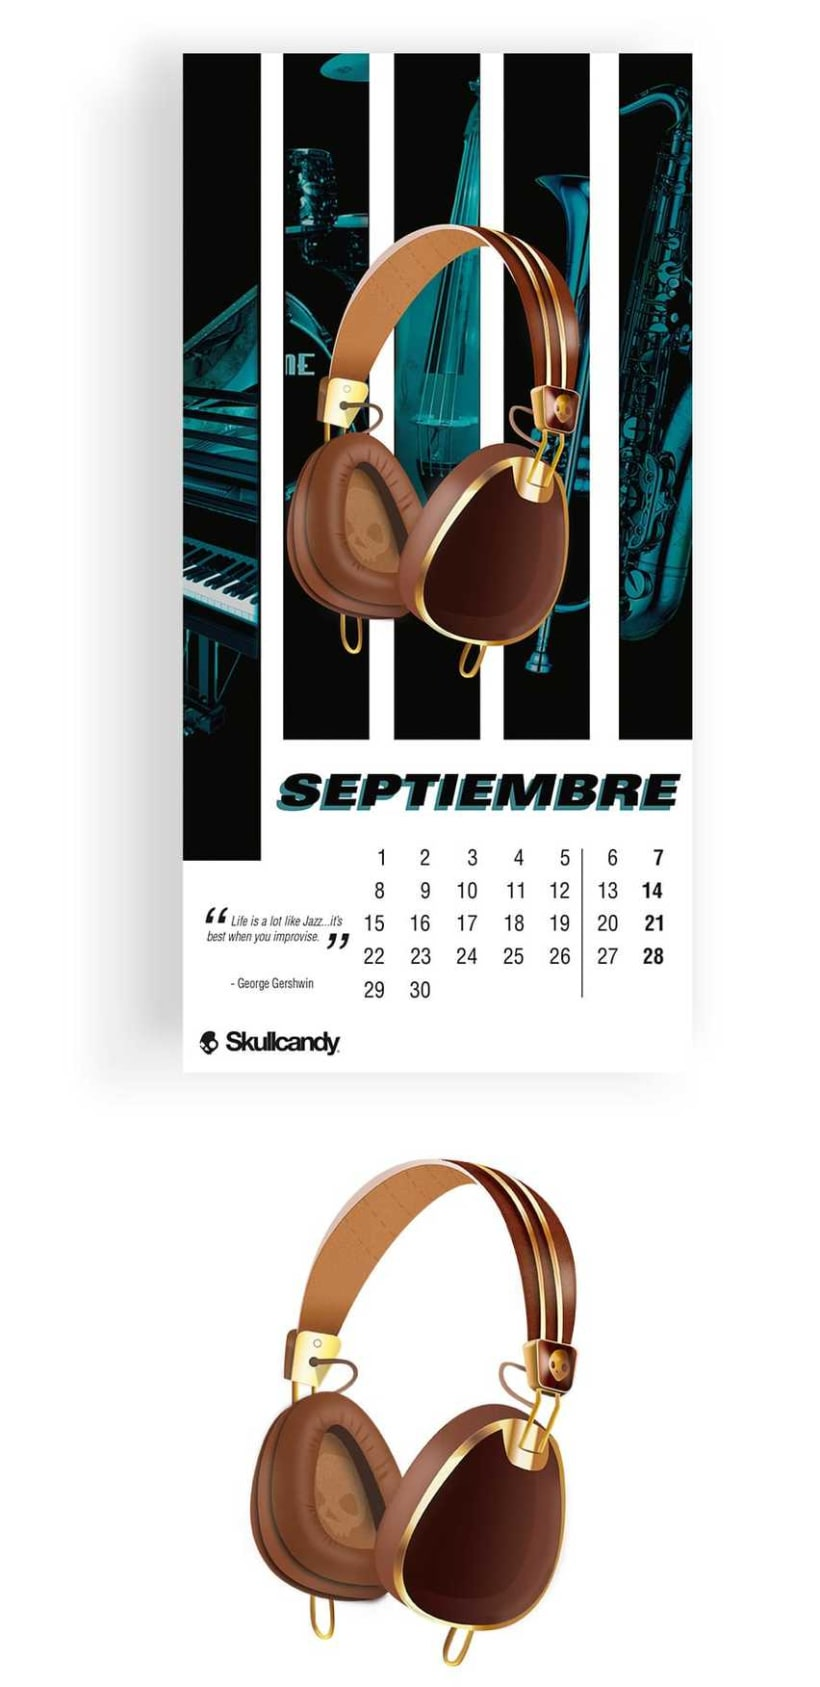 Calendario Skullcandy -1